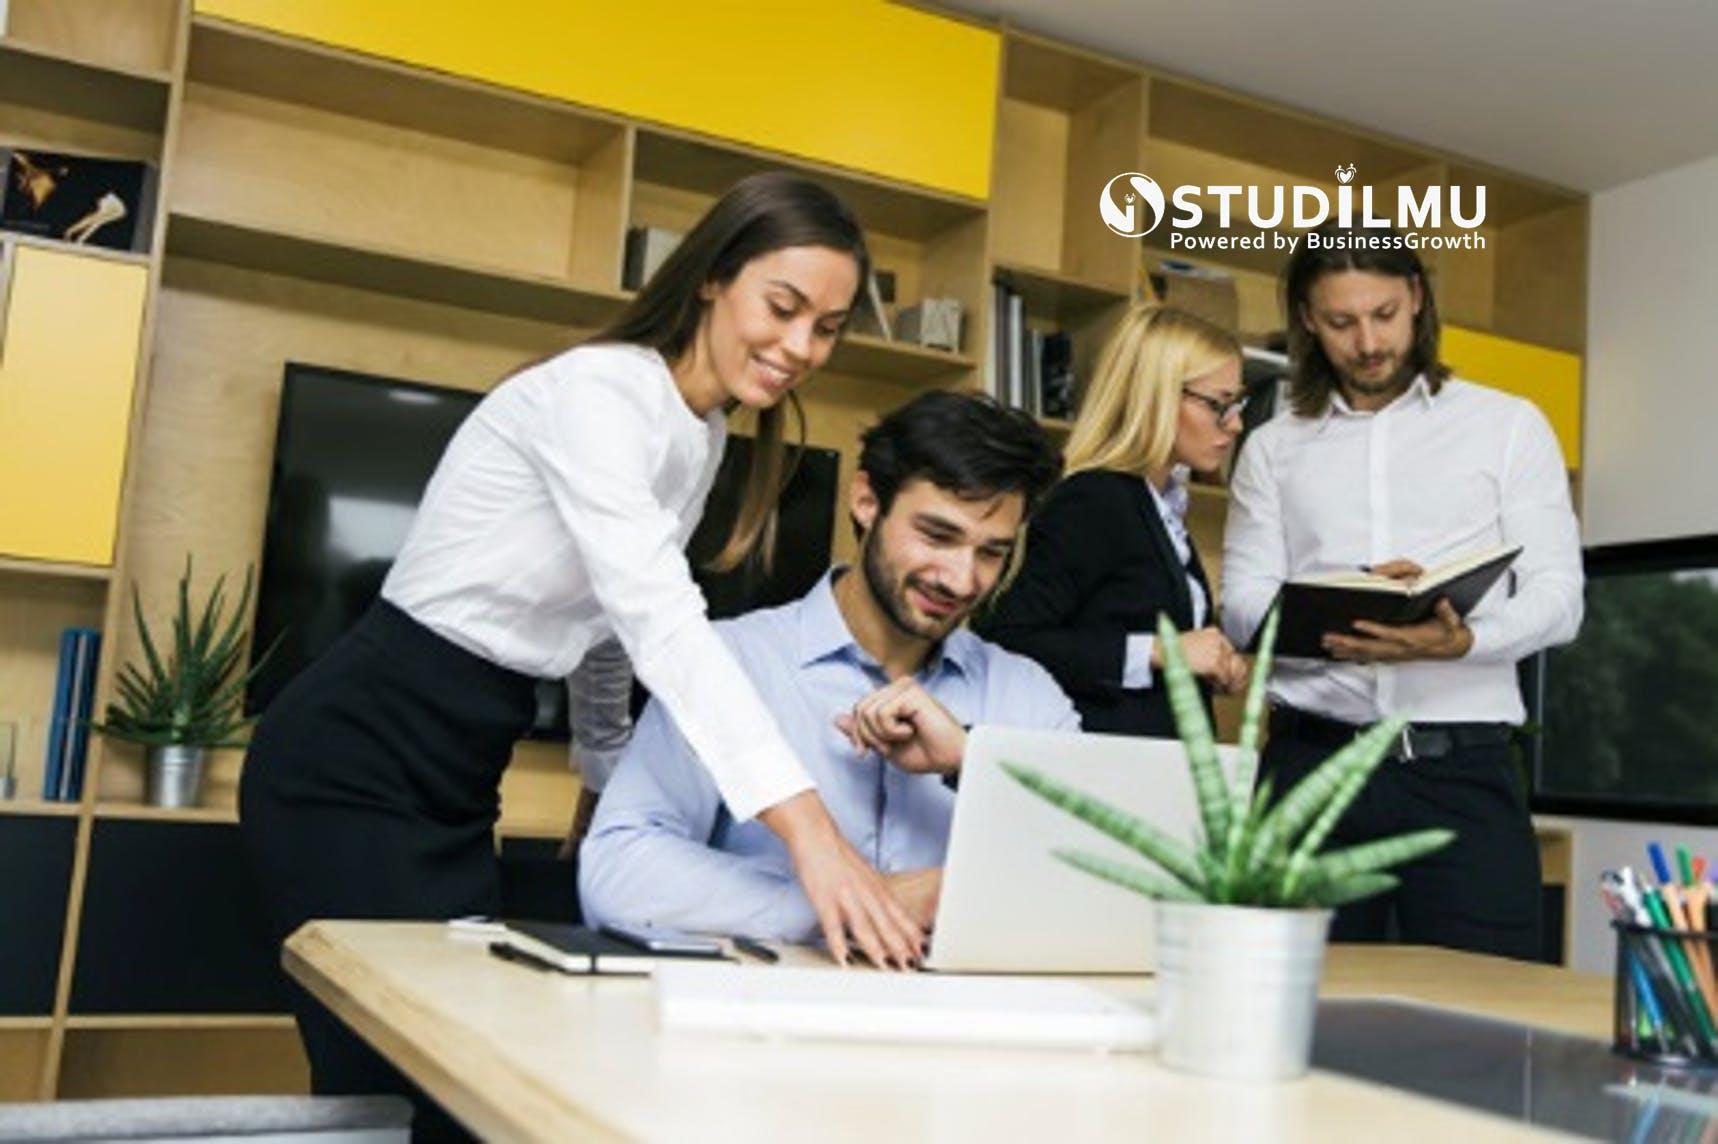 STUDILMU Career Advice - 10 Cara Tetap Semangat dan Termotivasi seperti Pengusaha Sukses